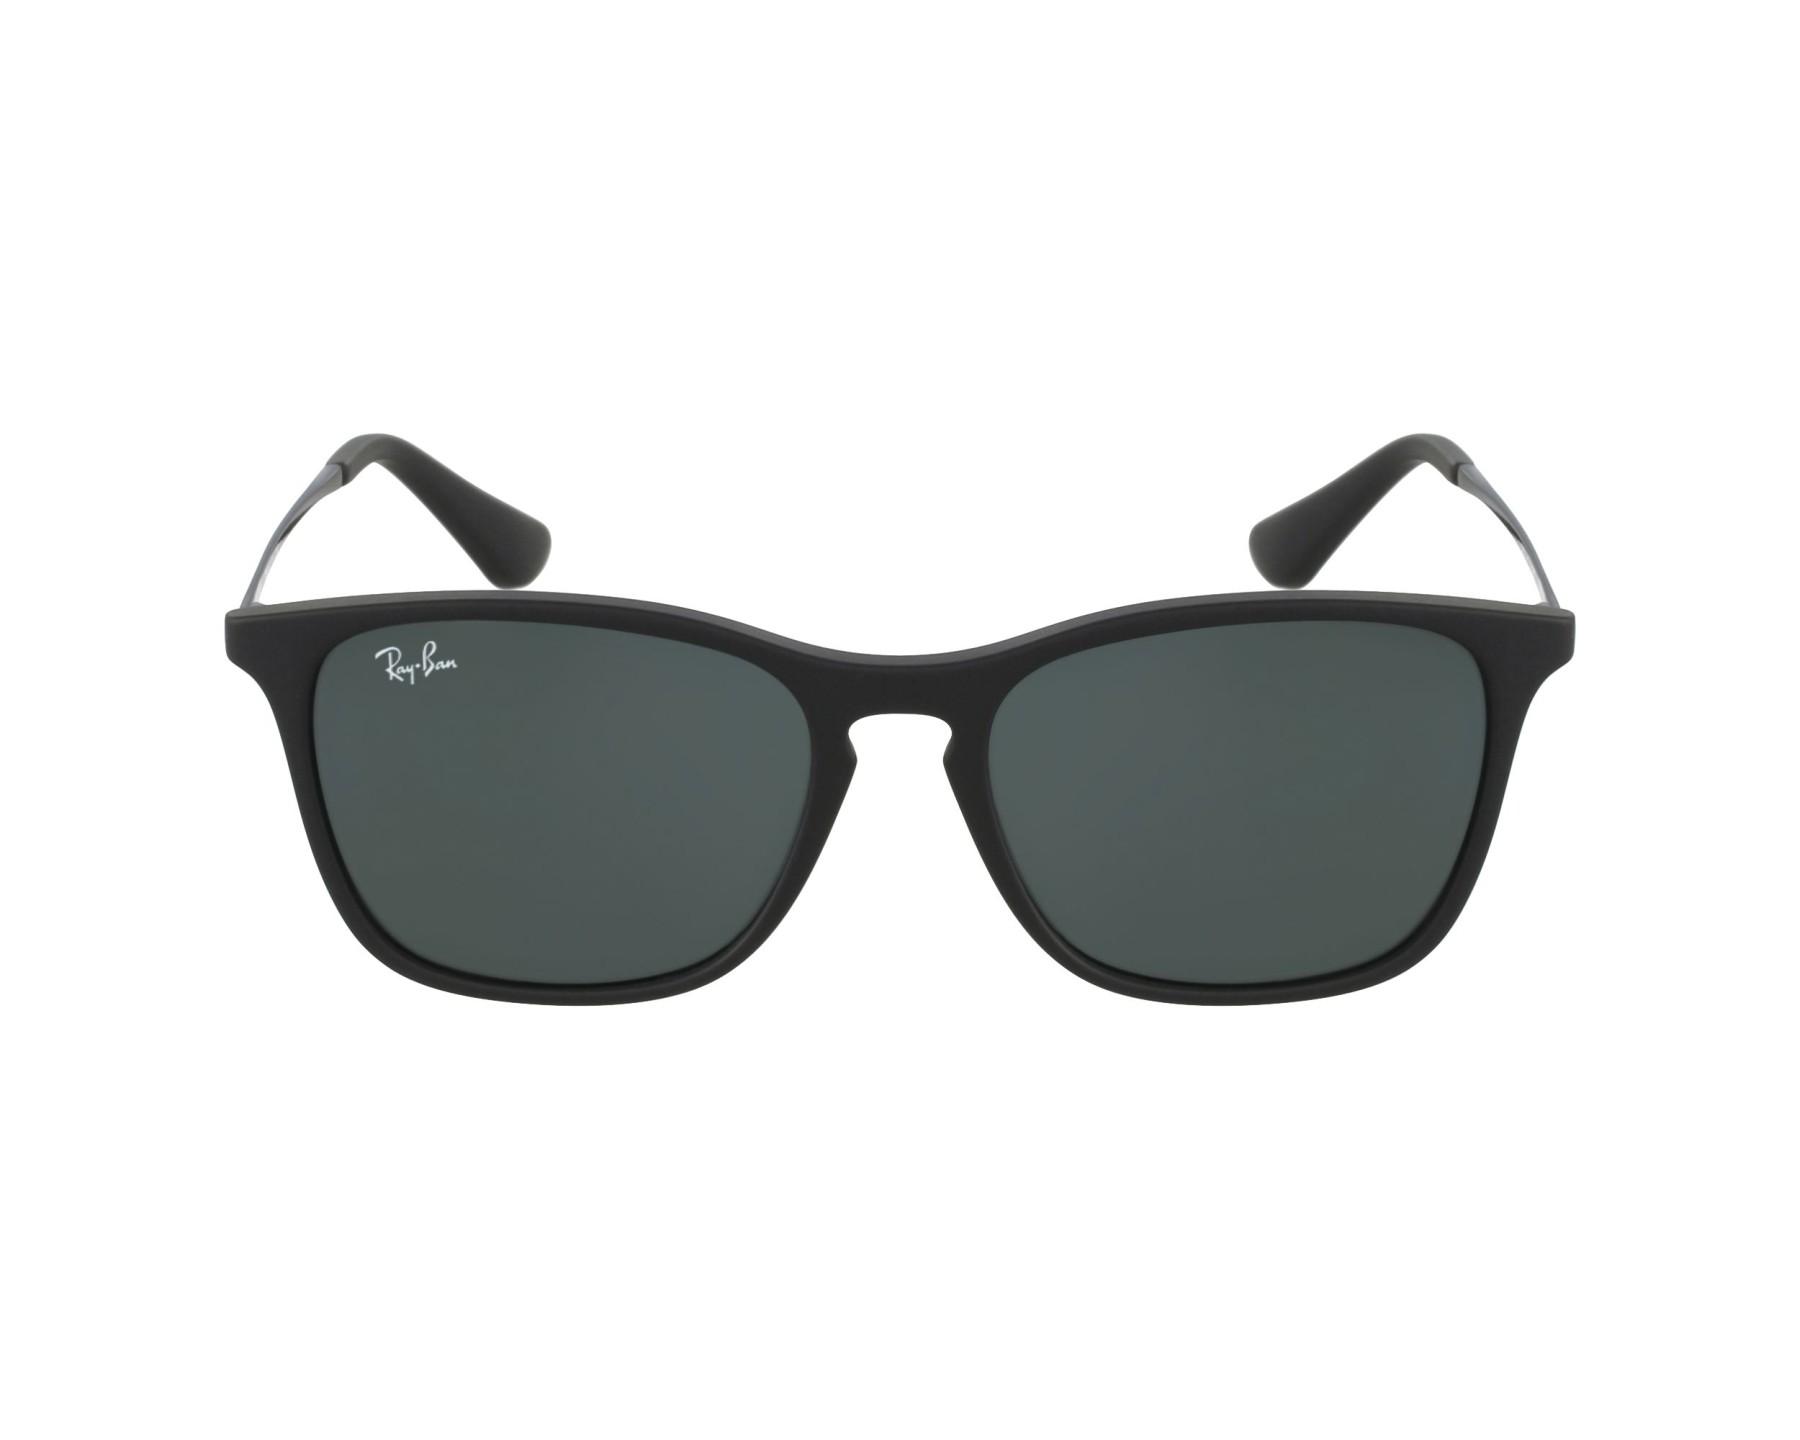 ray ban sonnenbrille junior rj 9061 s 700571. Black Bedroom Furniture Sets. Home Design Ideas